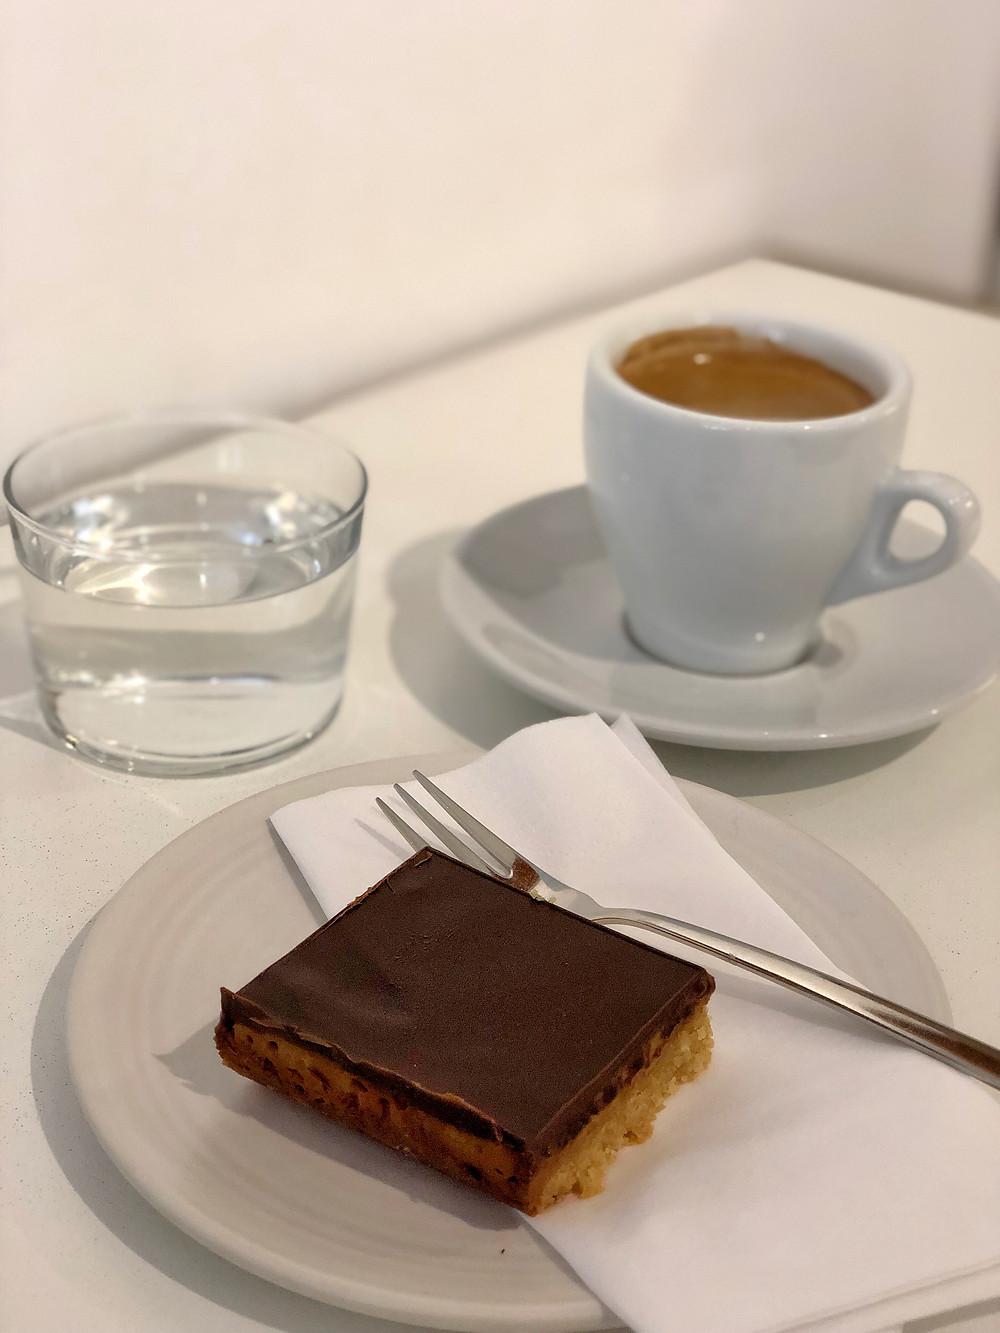 Coffee and cake at Borgman Borgman in Leiden